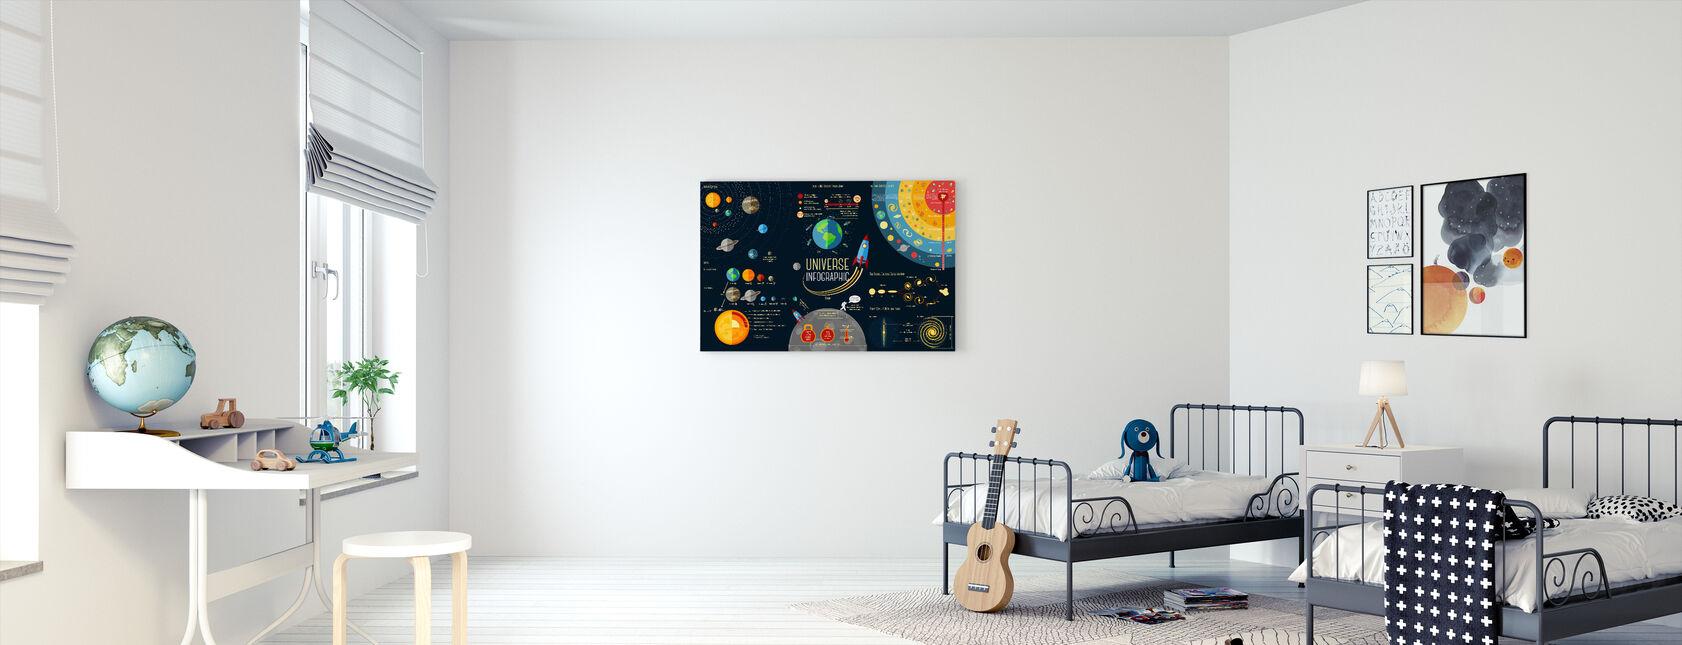 Ruimtekaarten